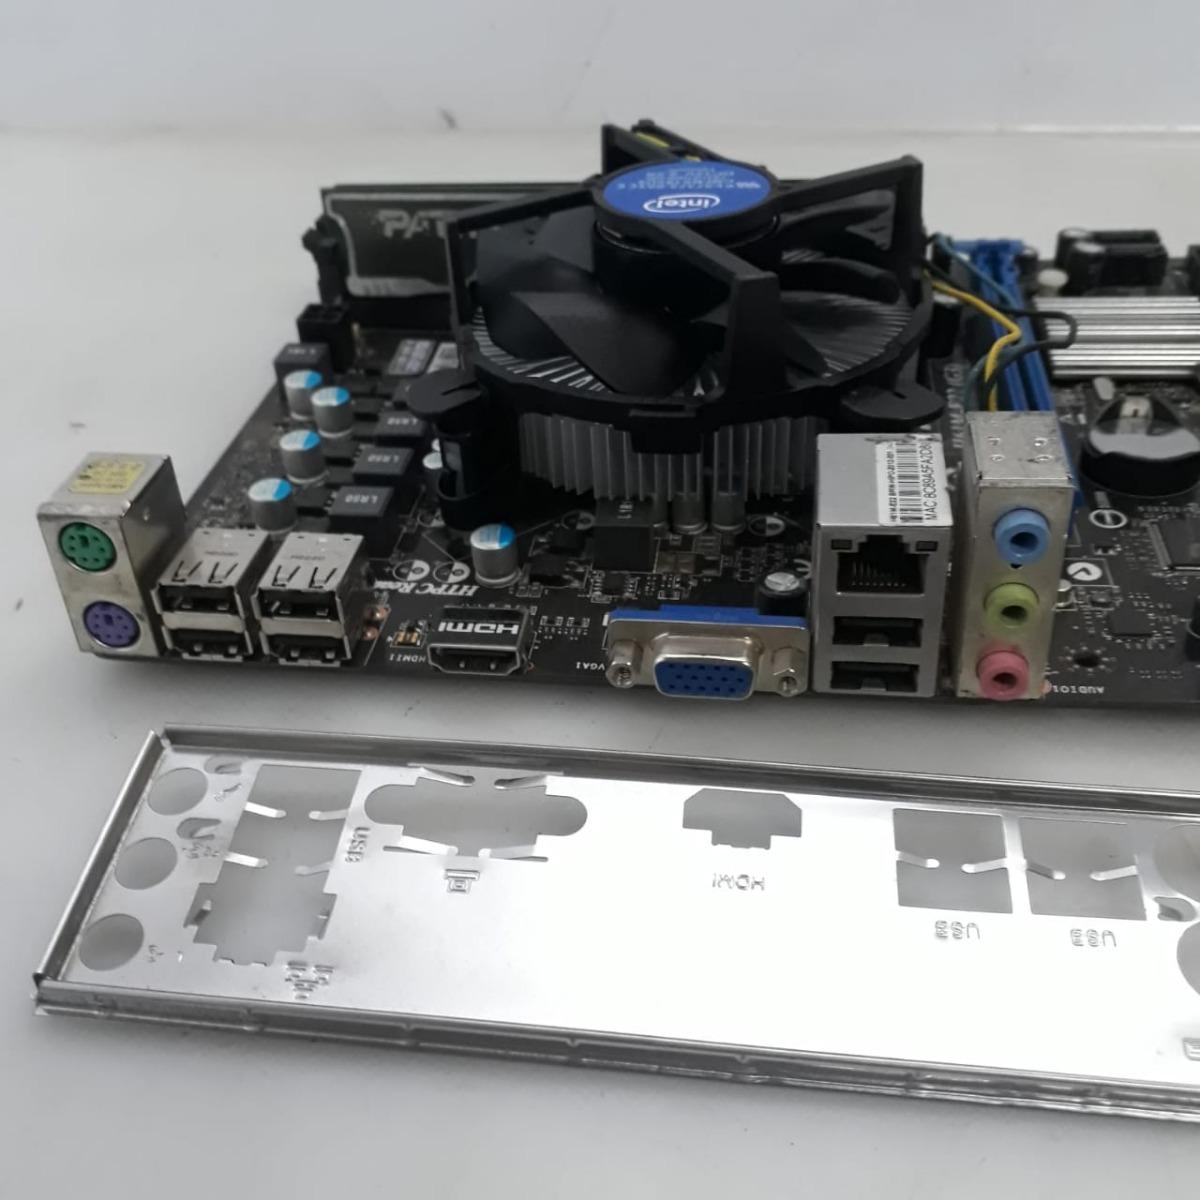 MSI H61M-E22 (G3) Control Center Drivers for Windows 7